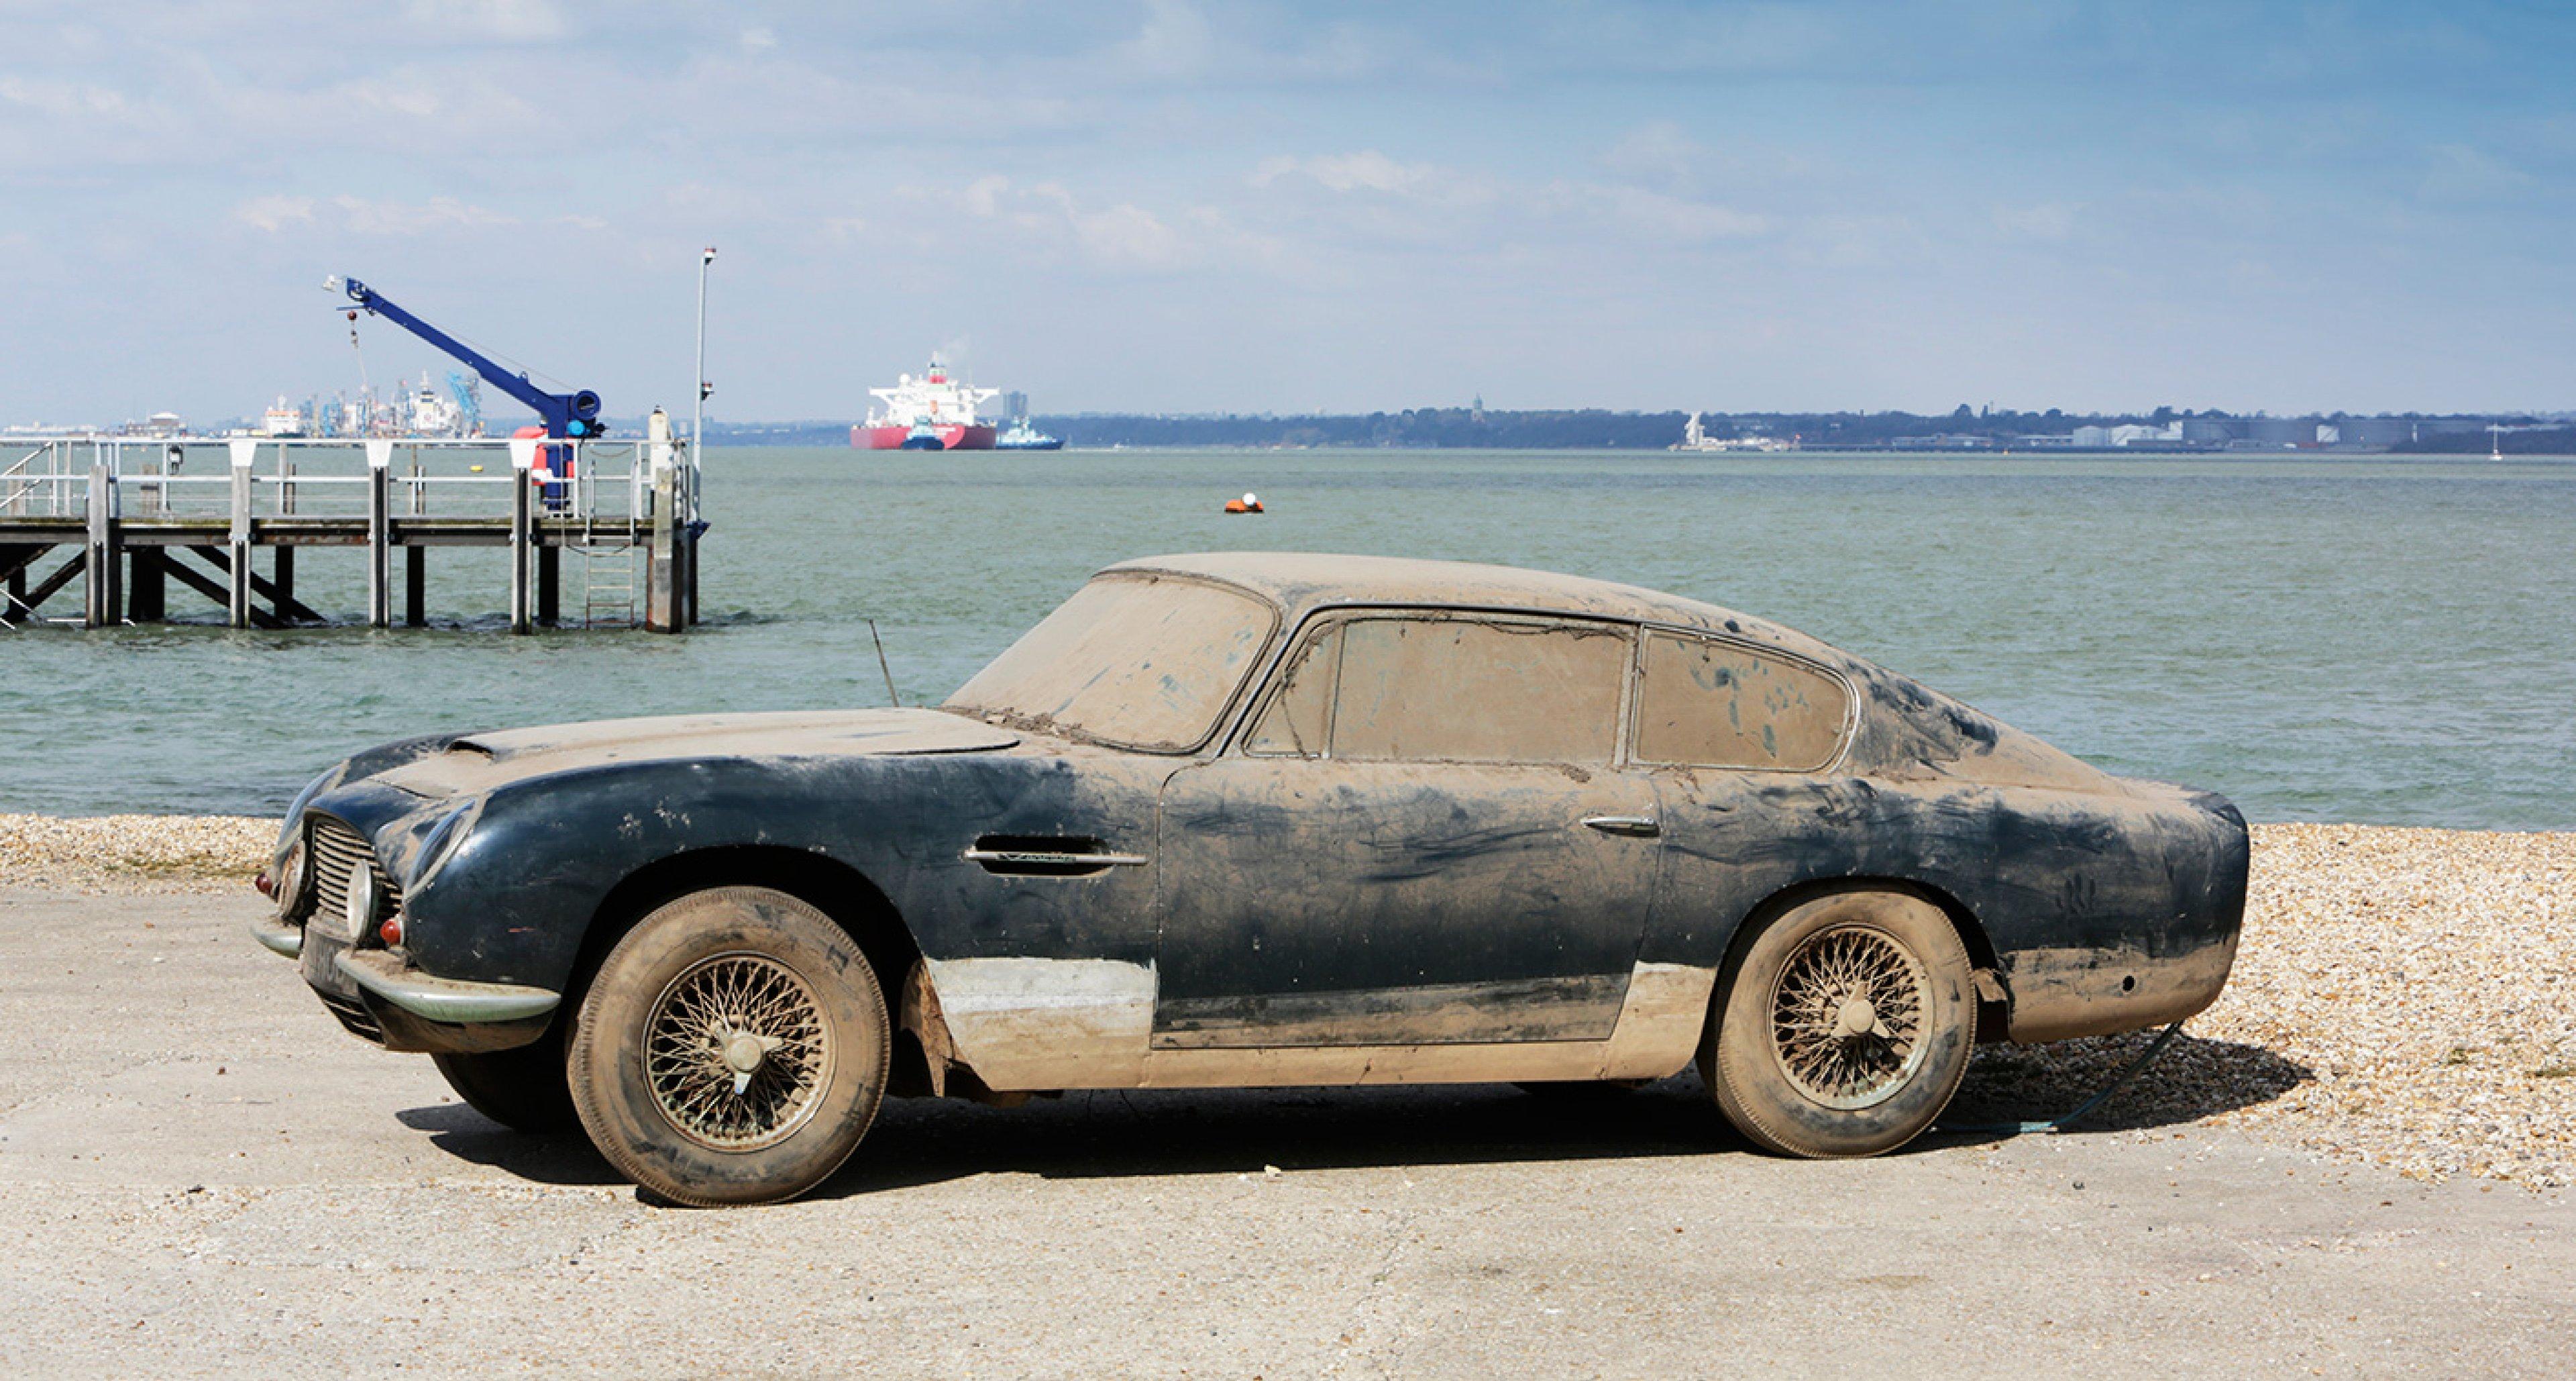 1966 Aston Martin DB6 Vantage sold by Bonhams in 2013 for £107,900